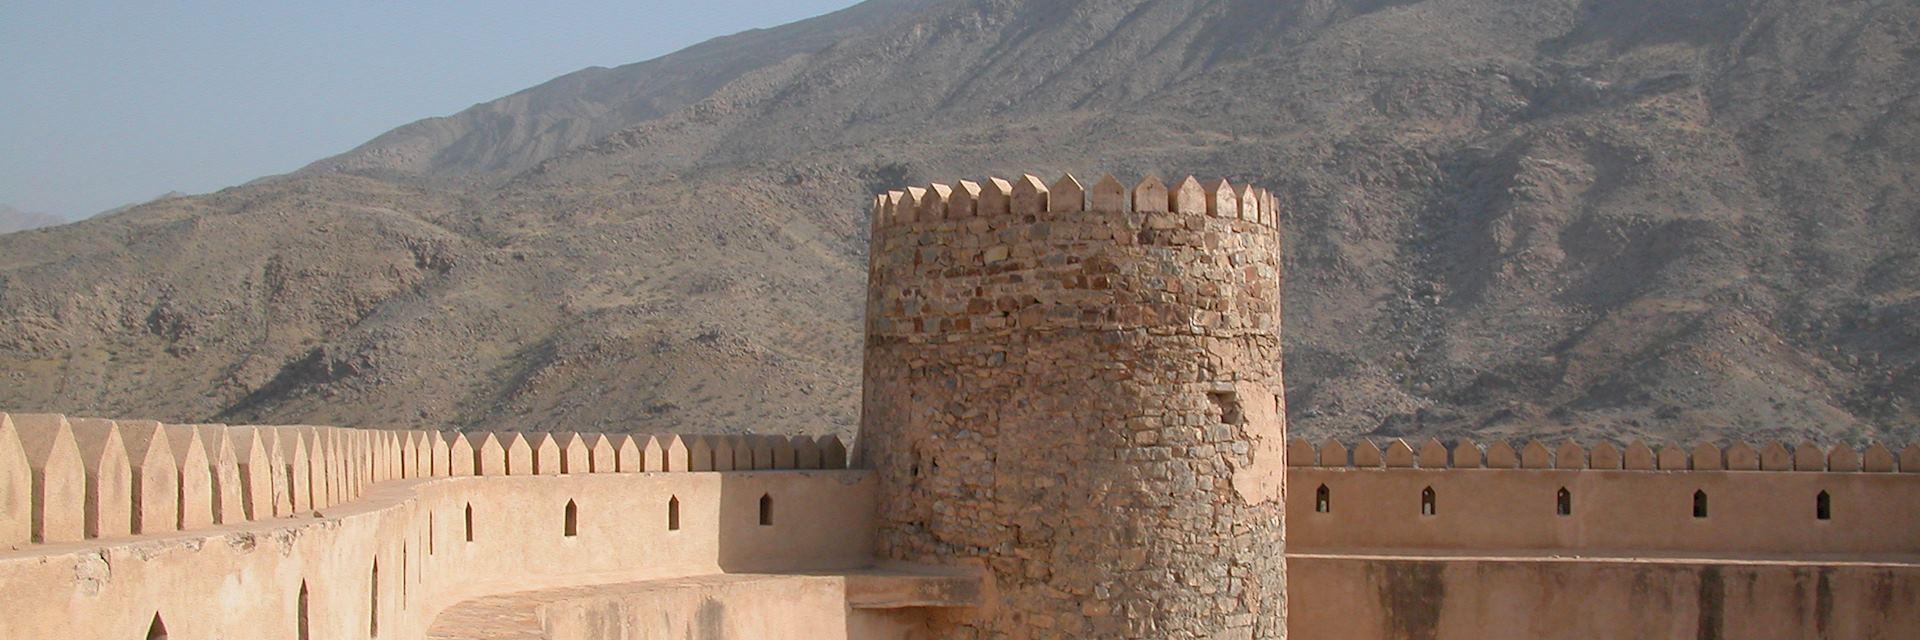 Al Rustaq Fort, Batinah Plain